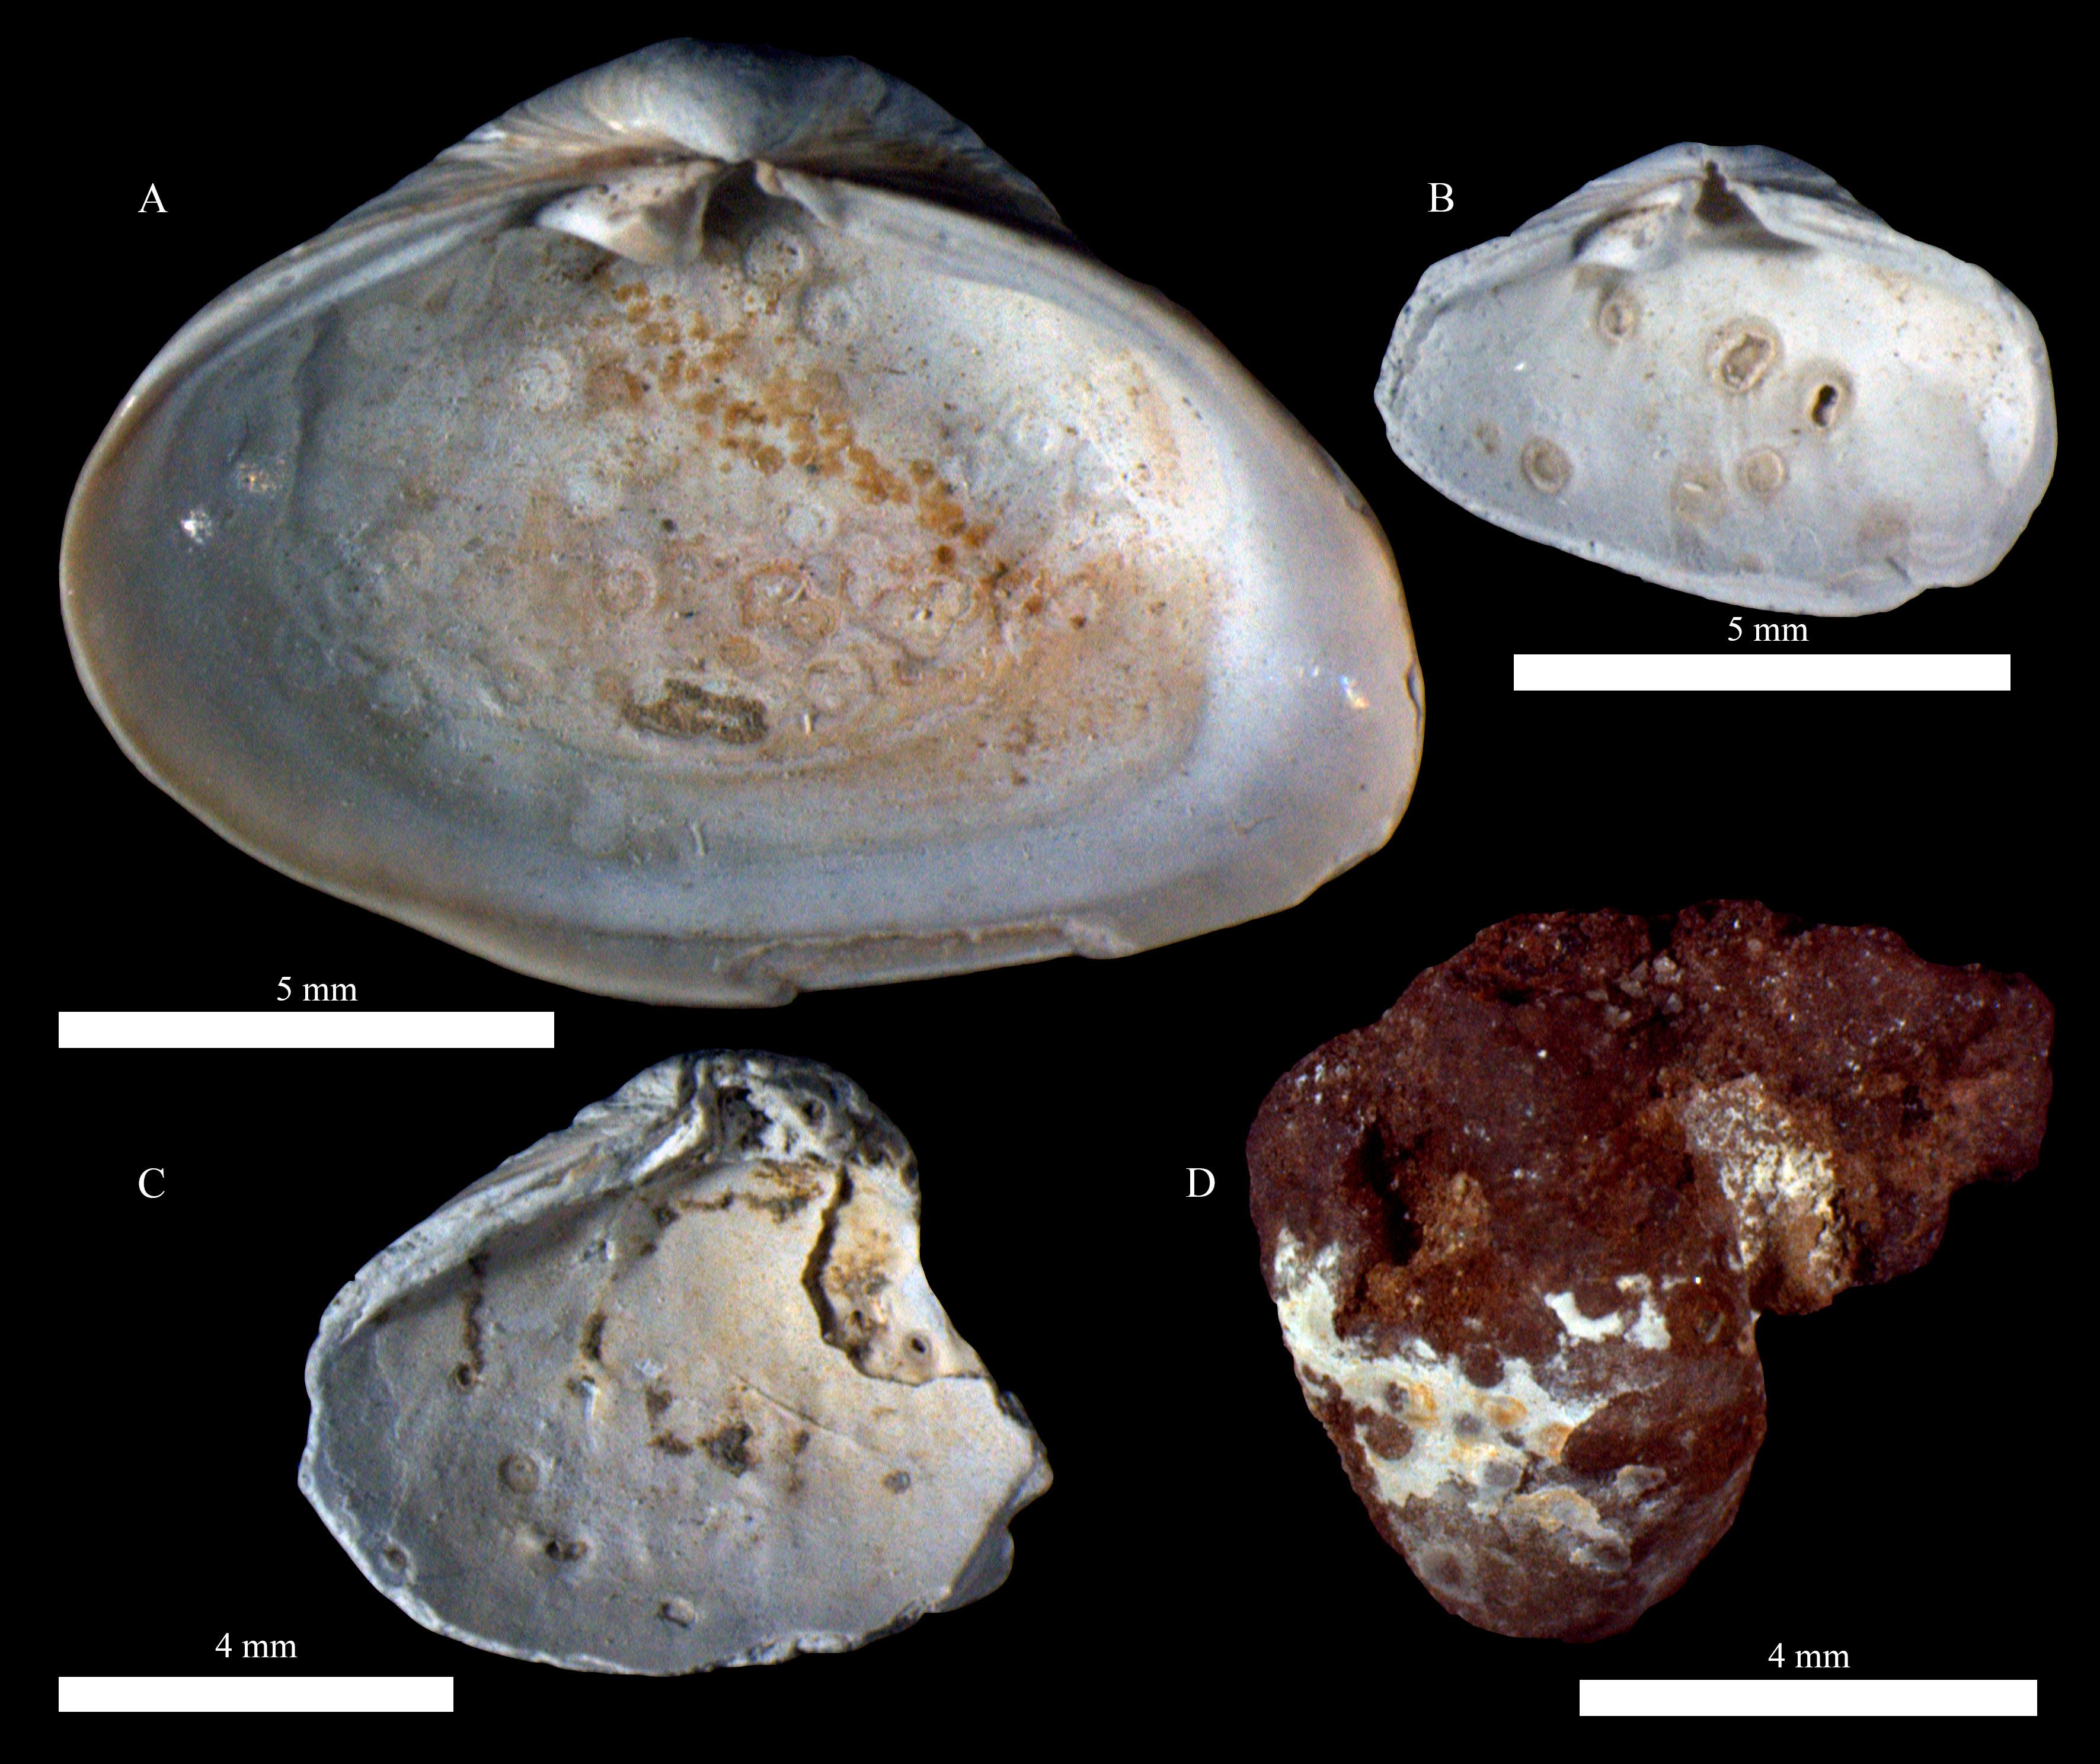 kagyló emberi parazita